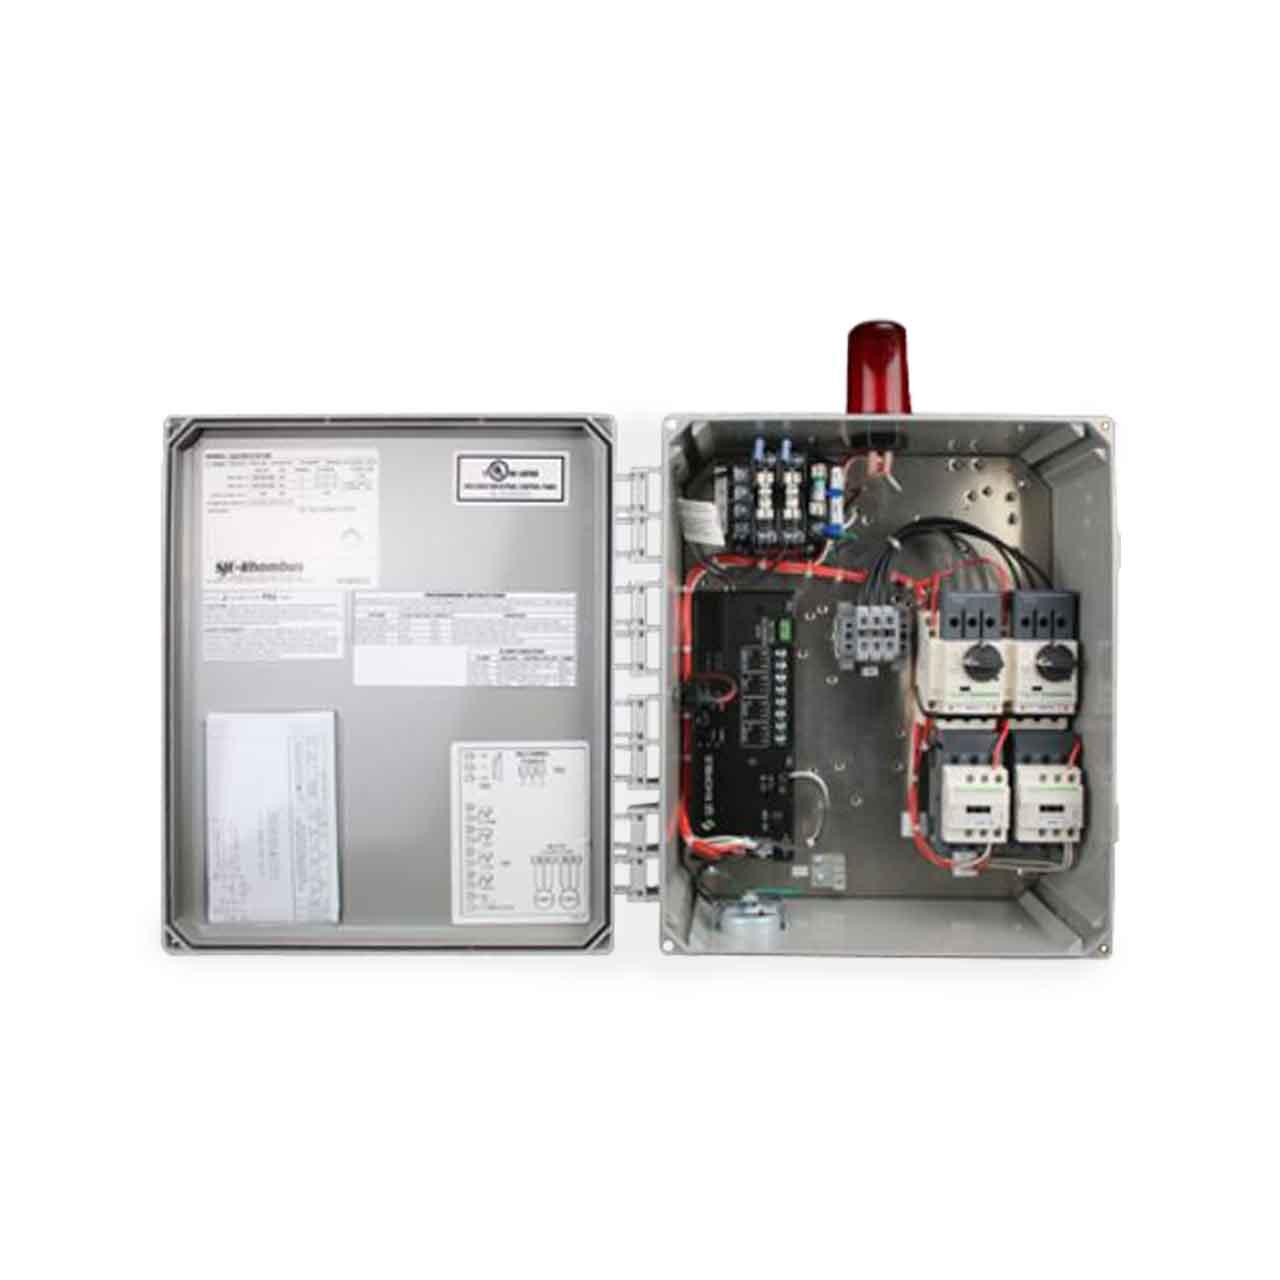 small resolution of sje rhombus sje rhombus model 322 3 phase 208 240 480 600v duplex sump pump float switch diagram sje float switch wiring diagram